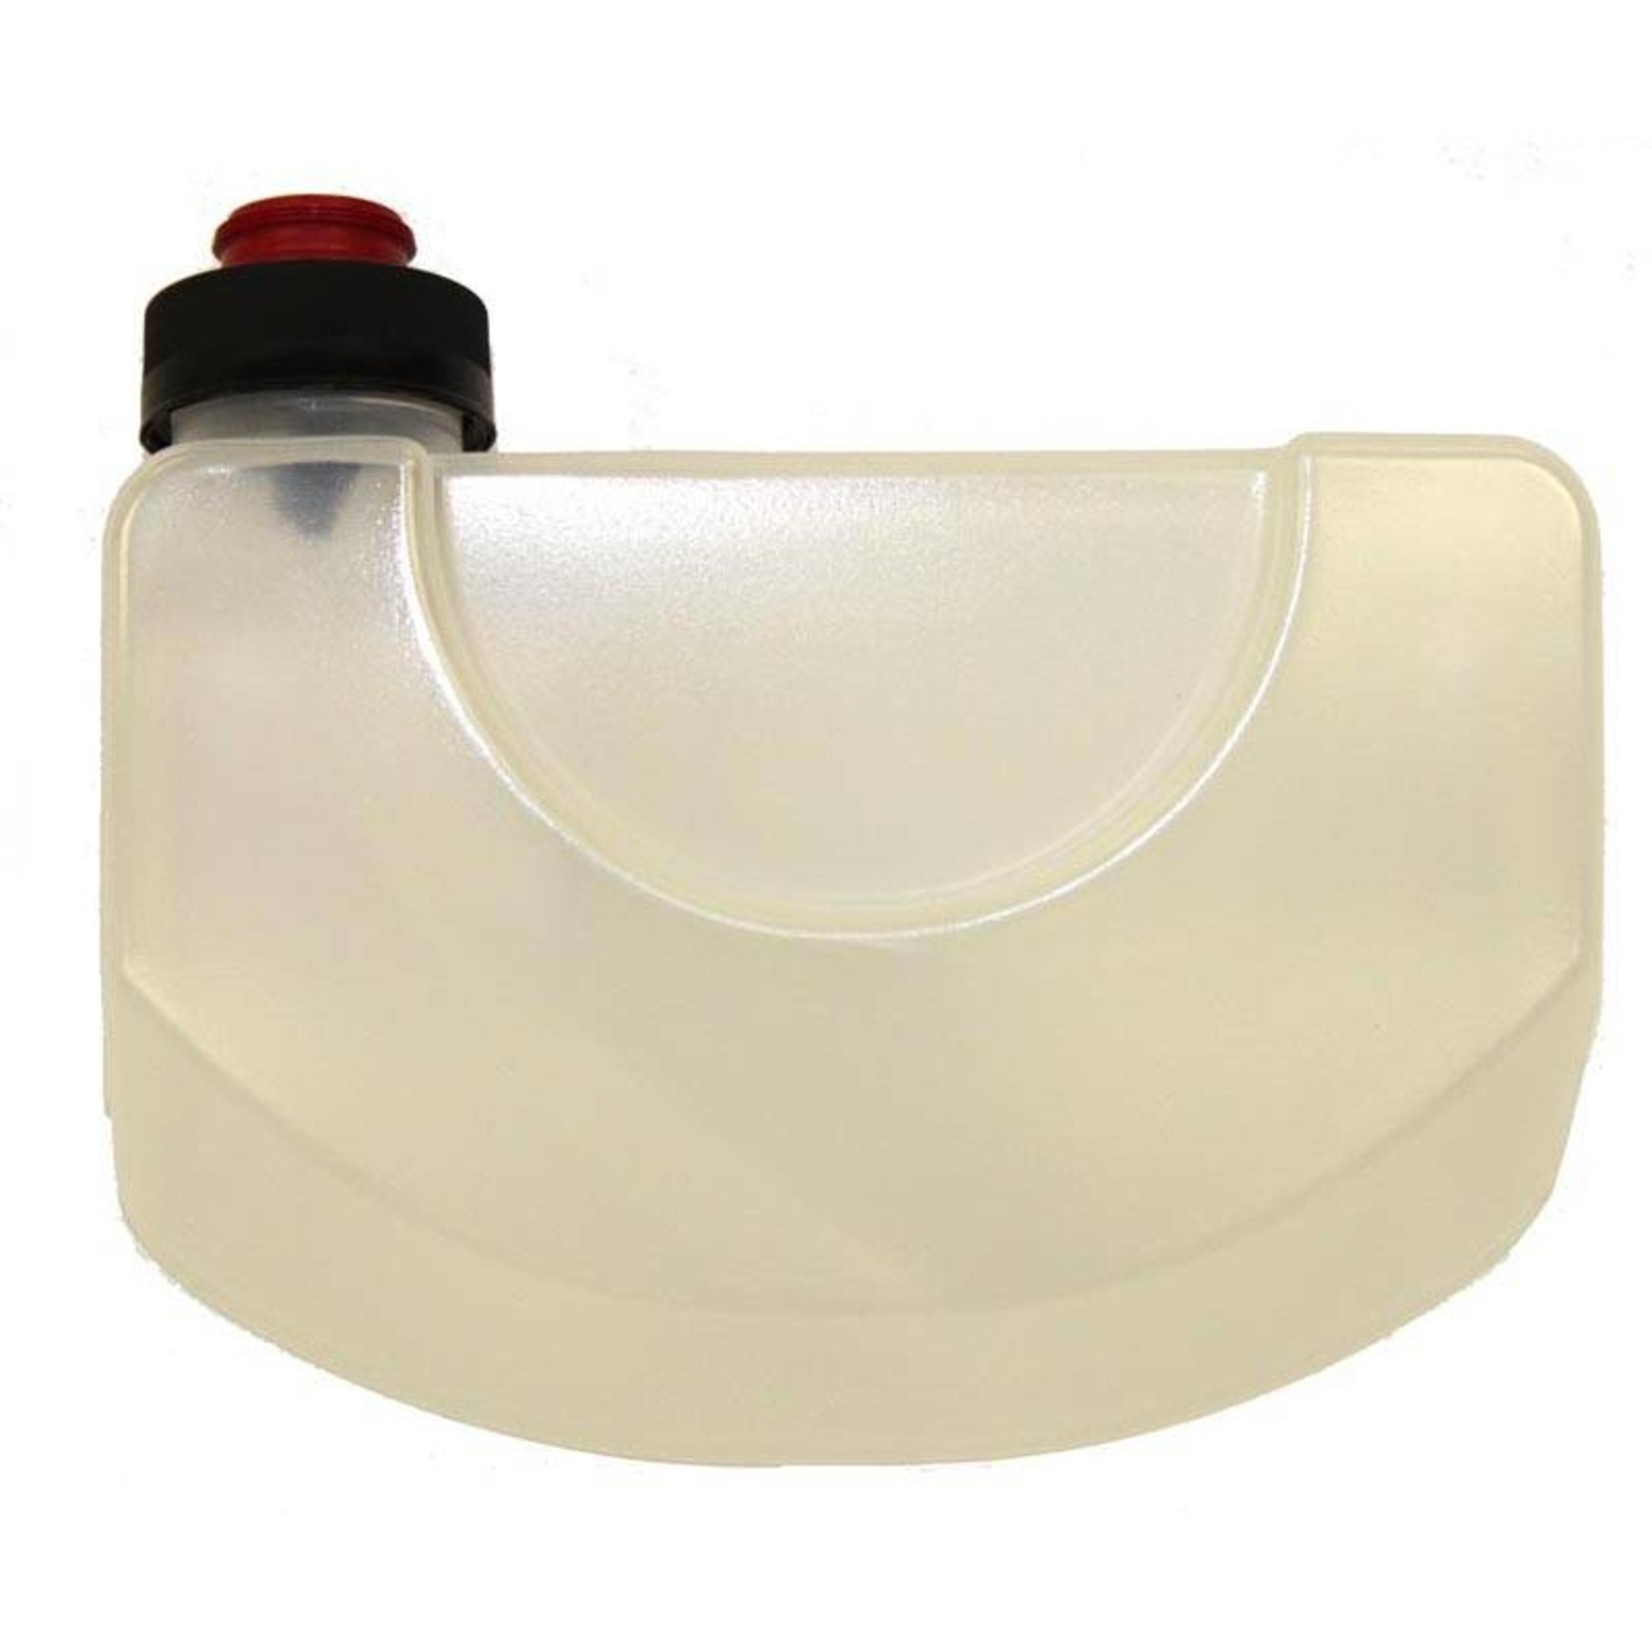 Bissell BIssell Formula Soap Tank